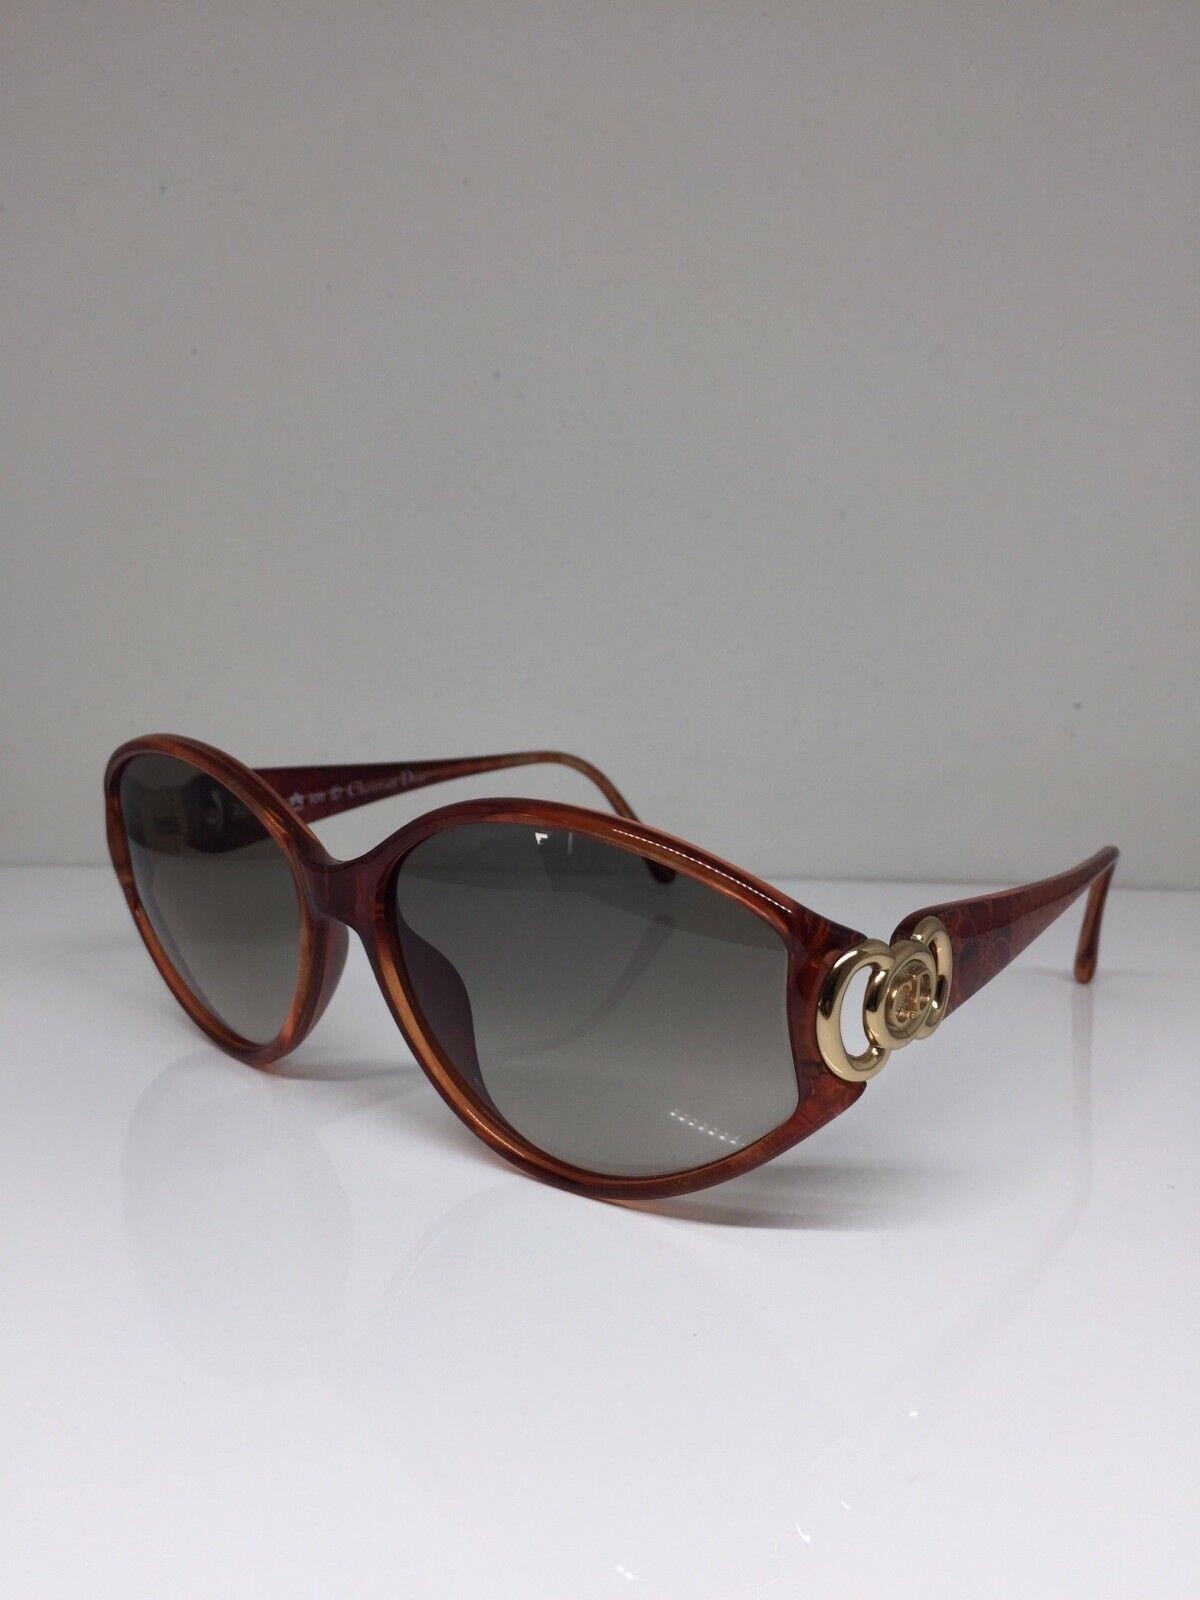 New Vintage Christian Dior CD 2850 Sunglasses C. Carnelian w/ Gold Austria 59mm